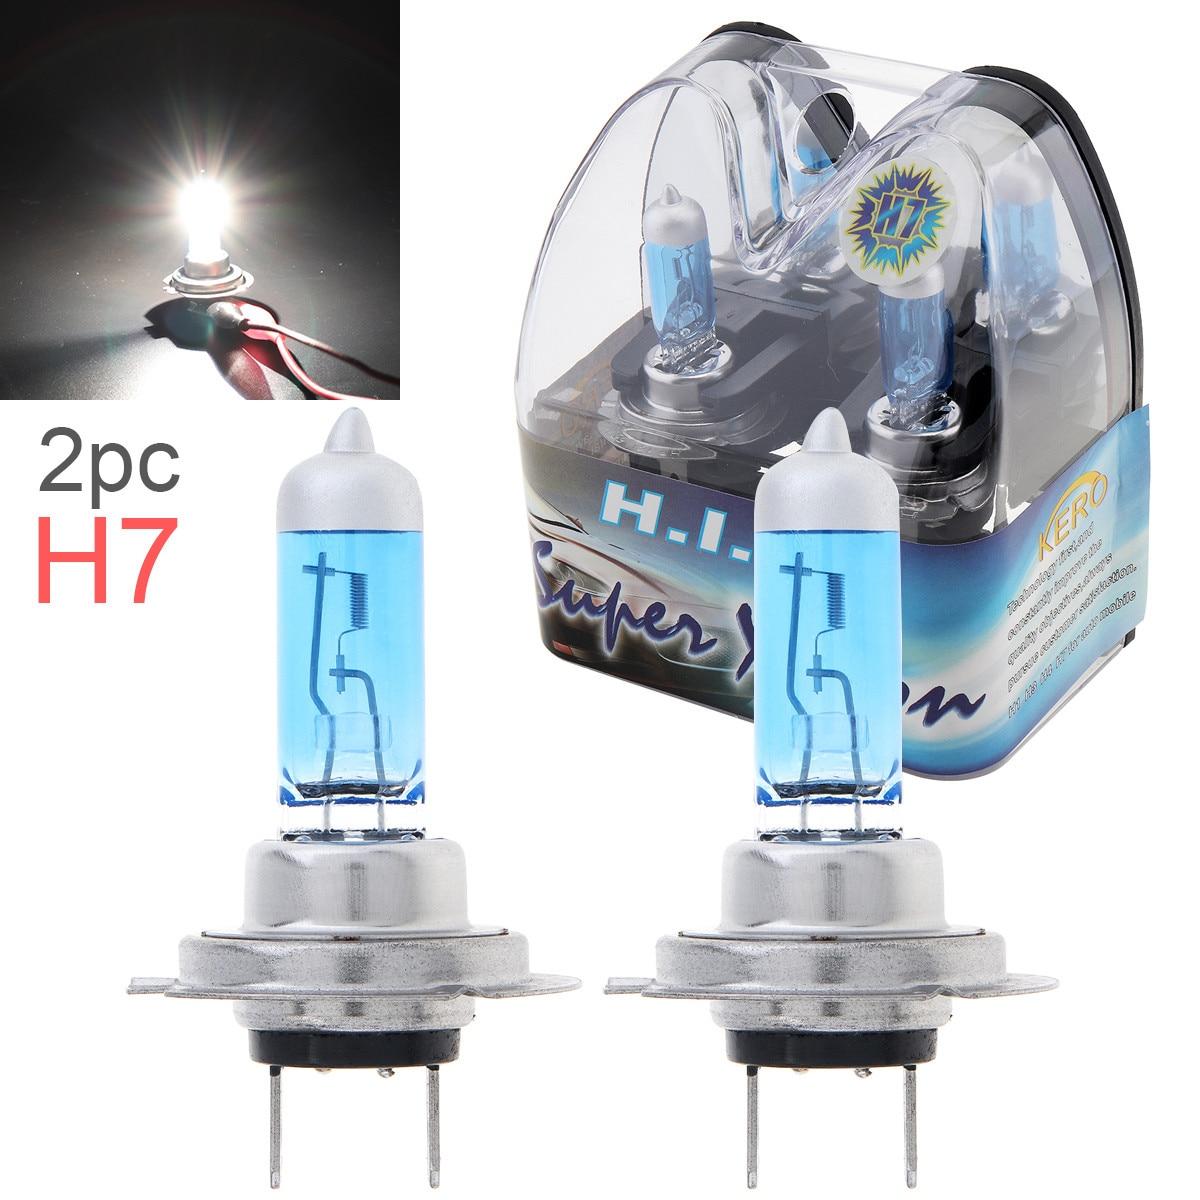 2pcs 12V H7 55W 6000K White Light Super Bright Car Xenon Halogen Lamp Auto Front Headlight Car Fog Light Bulb